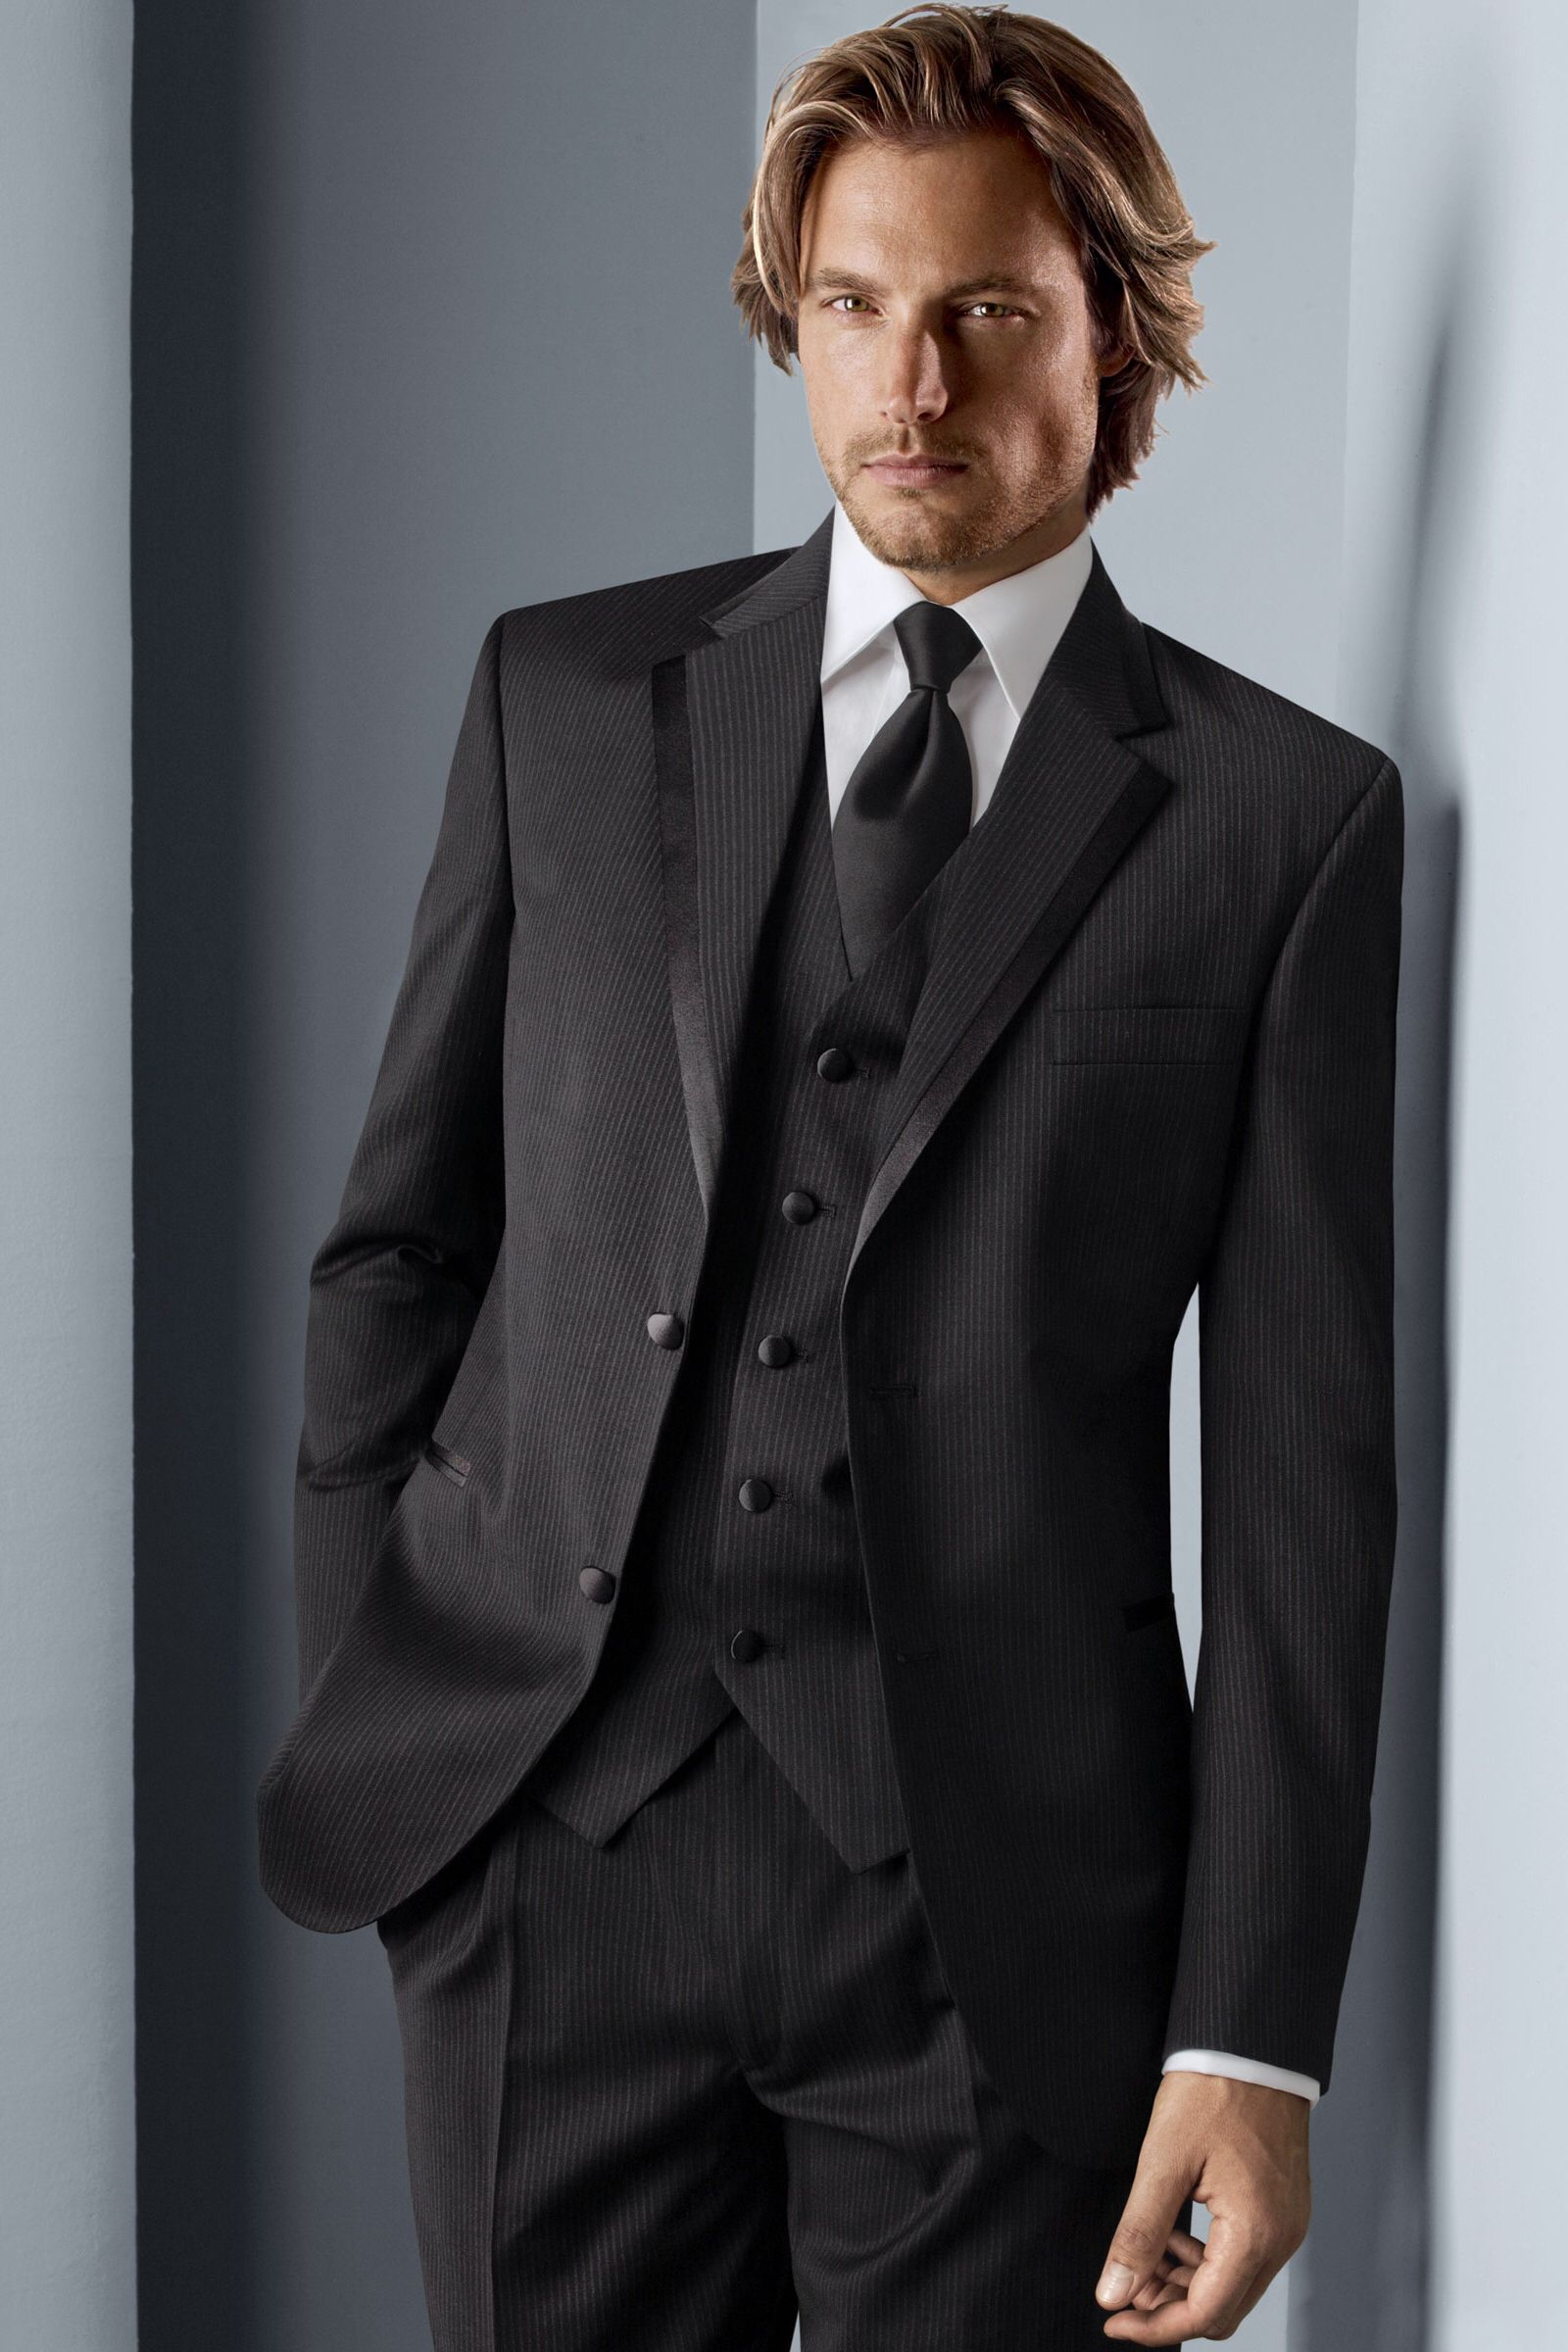 brillantezza del colore acquisto autentico buono sconto HLo-Tips: Smoking marca Calvin Klein para ese momento tan especial ...